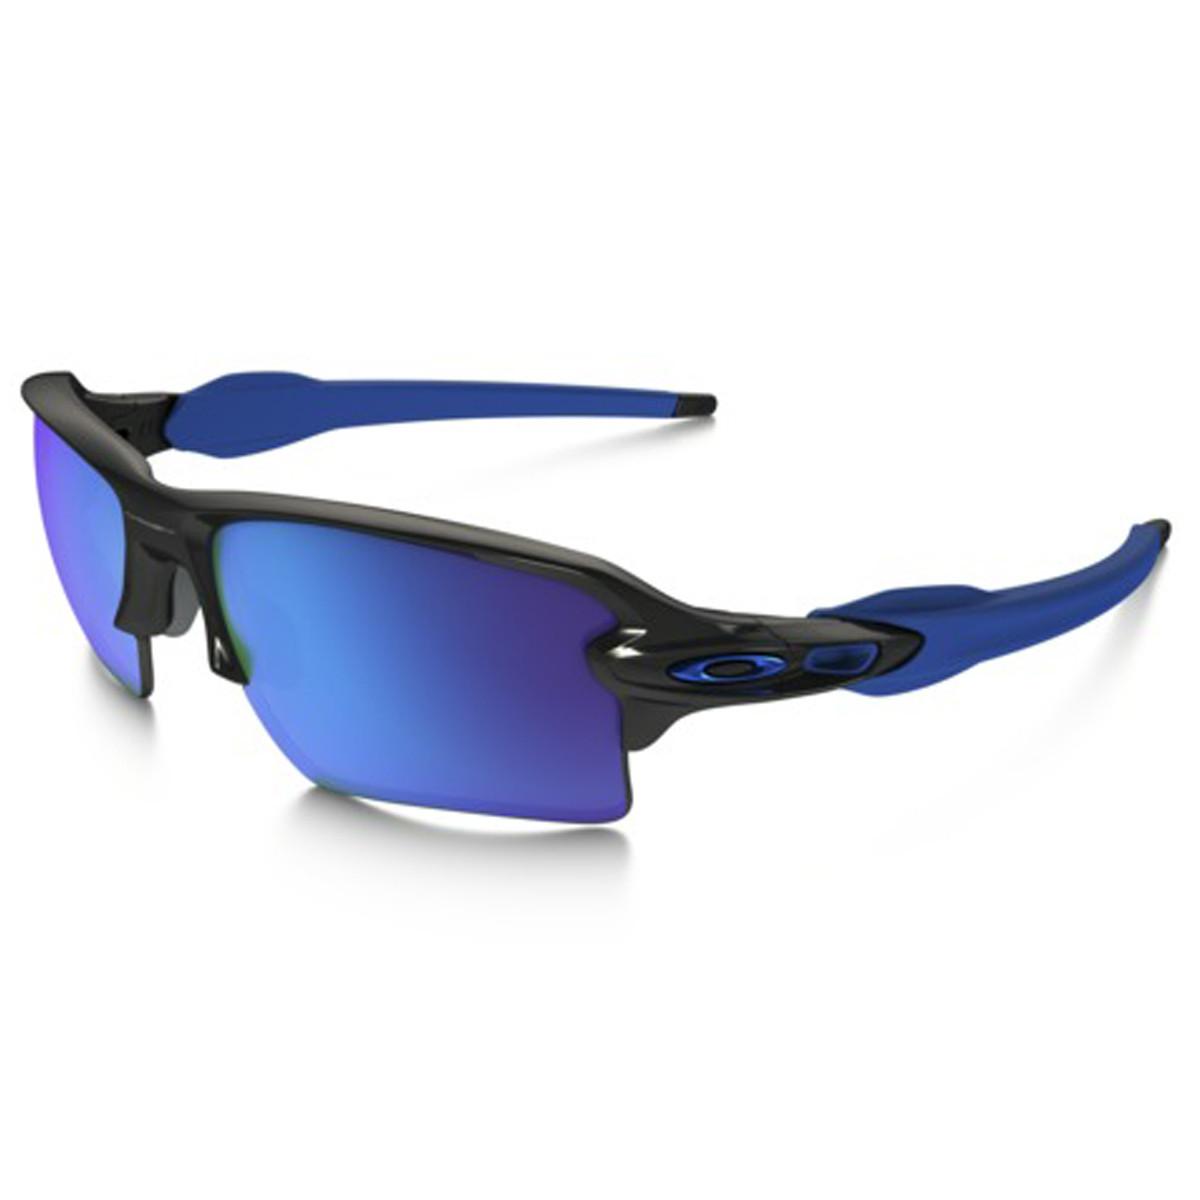 Óculos Oakley Flak 2.0 XL Polished Black Sapphire Iridium Ediçao Limitada  Olimpíadas Rio 2016 LANÇAMENTO 7413c0fbf6